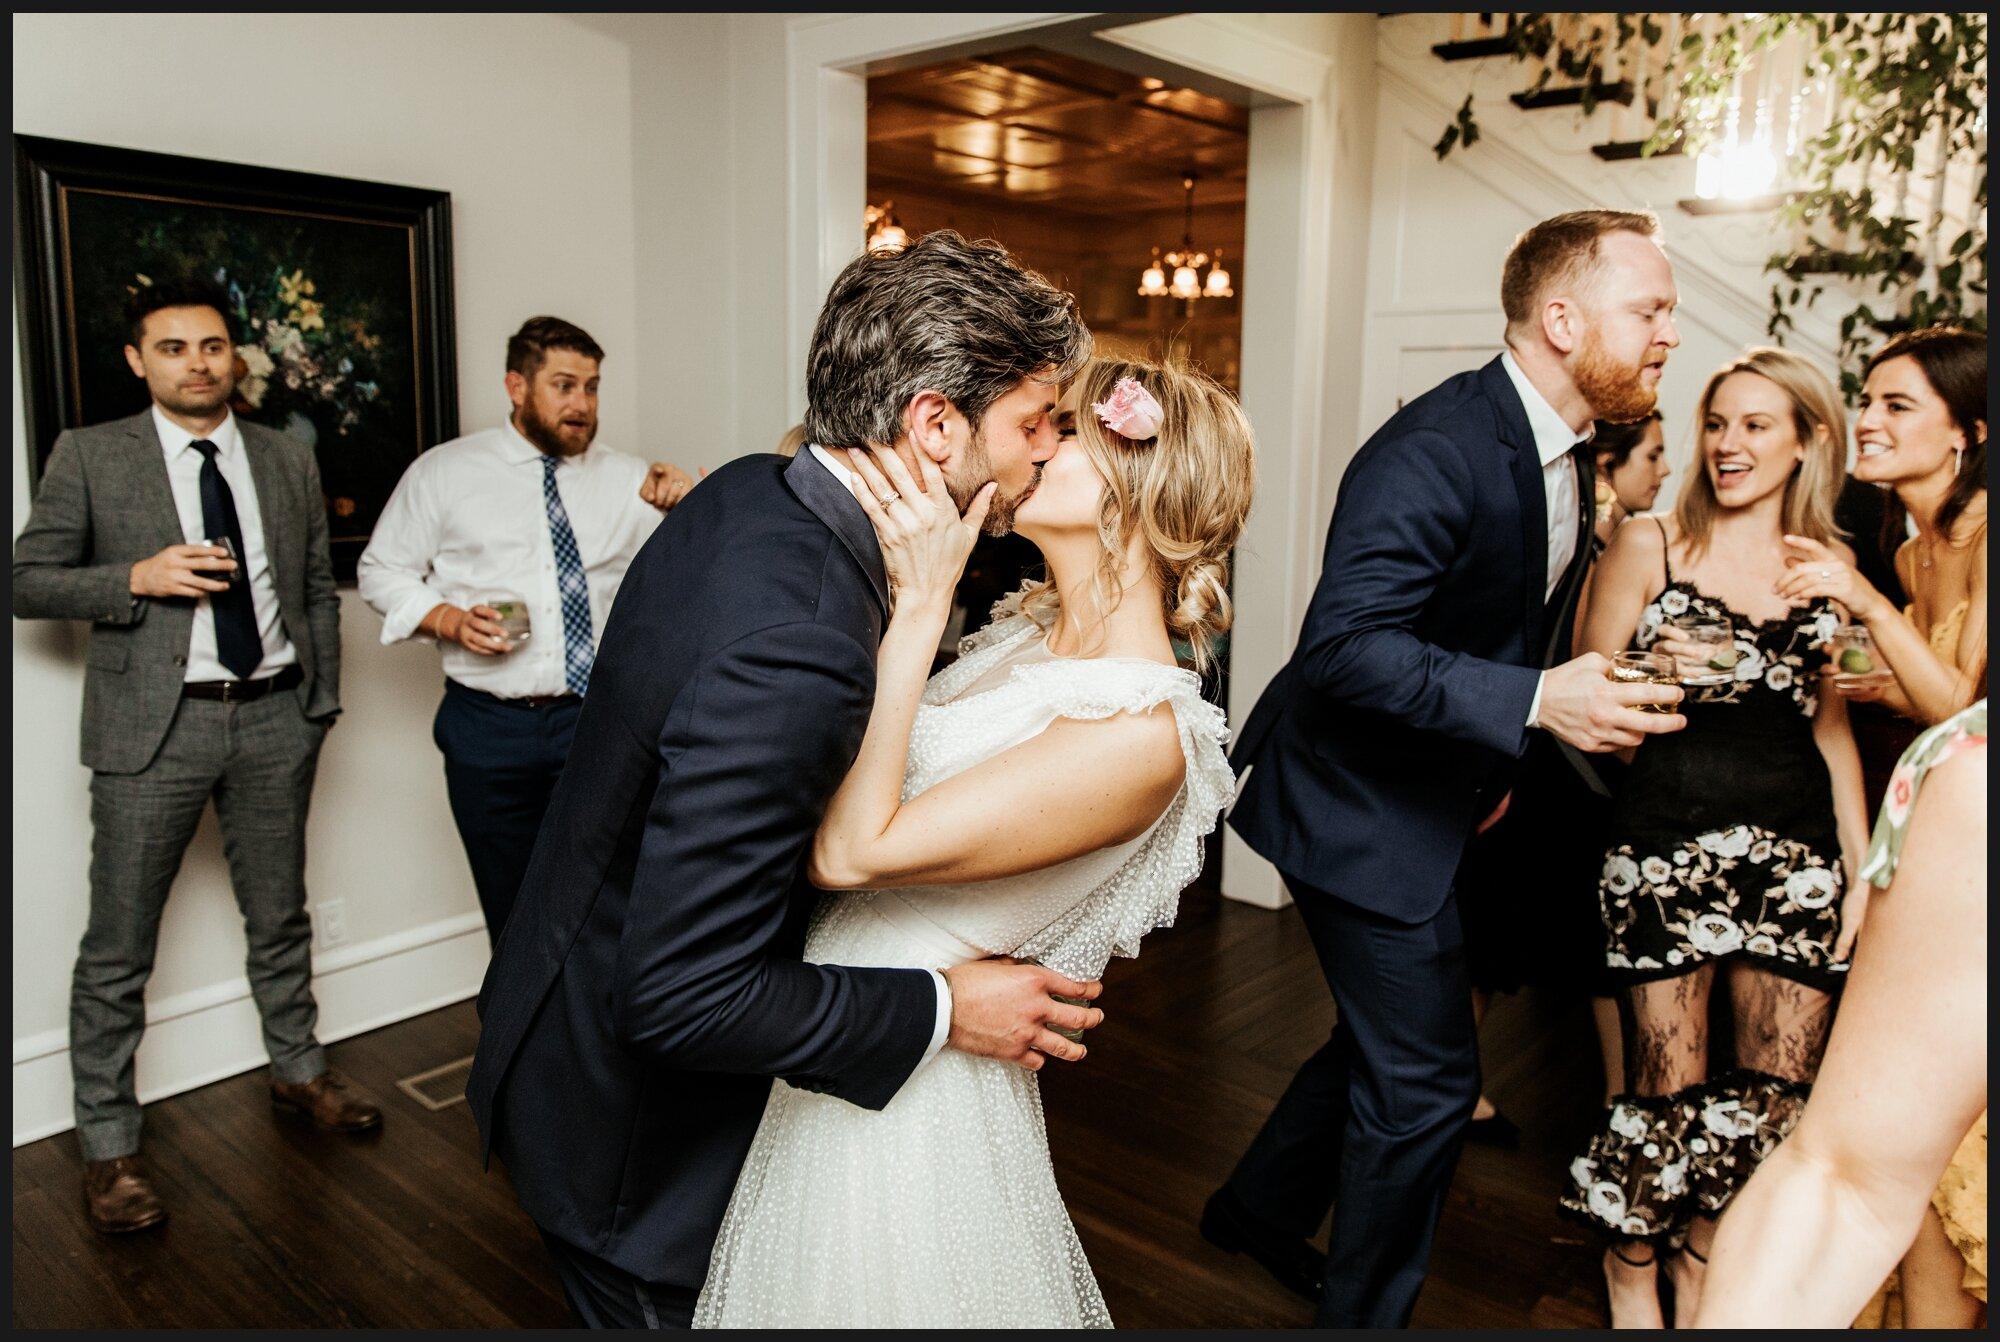 Orlando-Wedding-Photographer-destination-wedding-photographer-florida-wedding-photographer-hawaii-wedding-photographer_0768.jpg